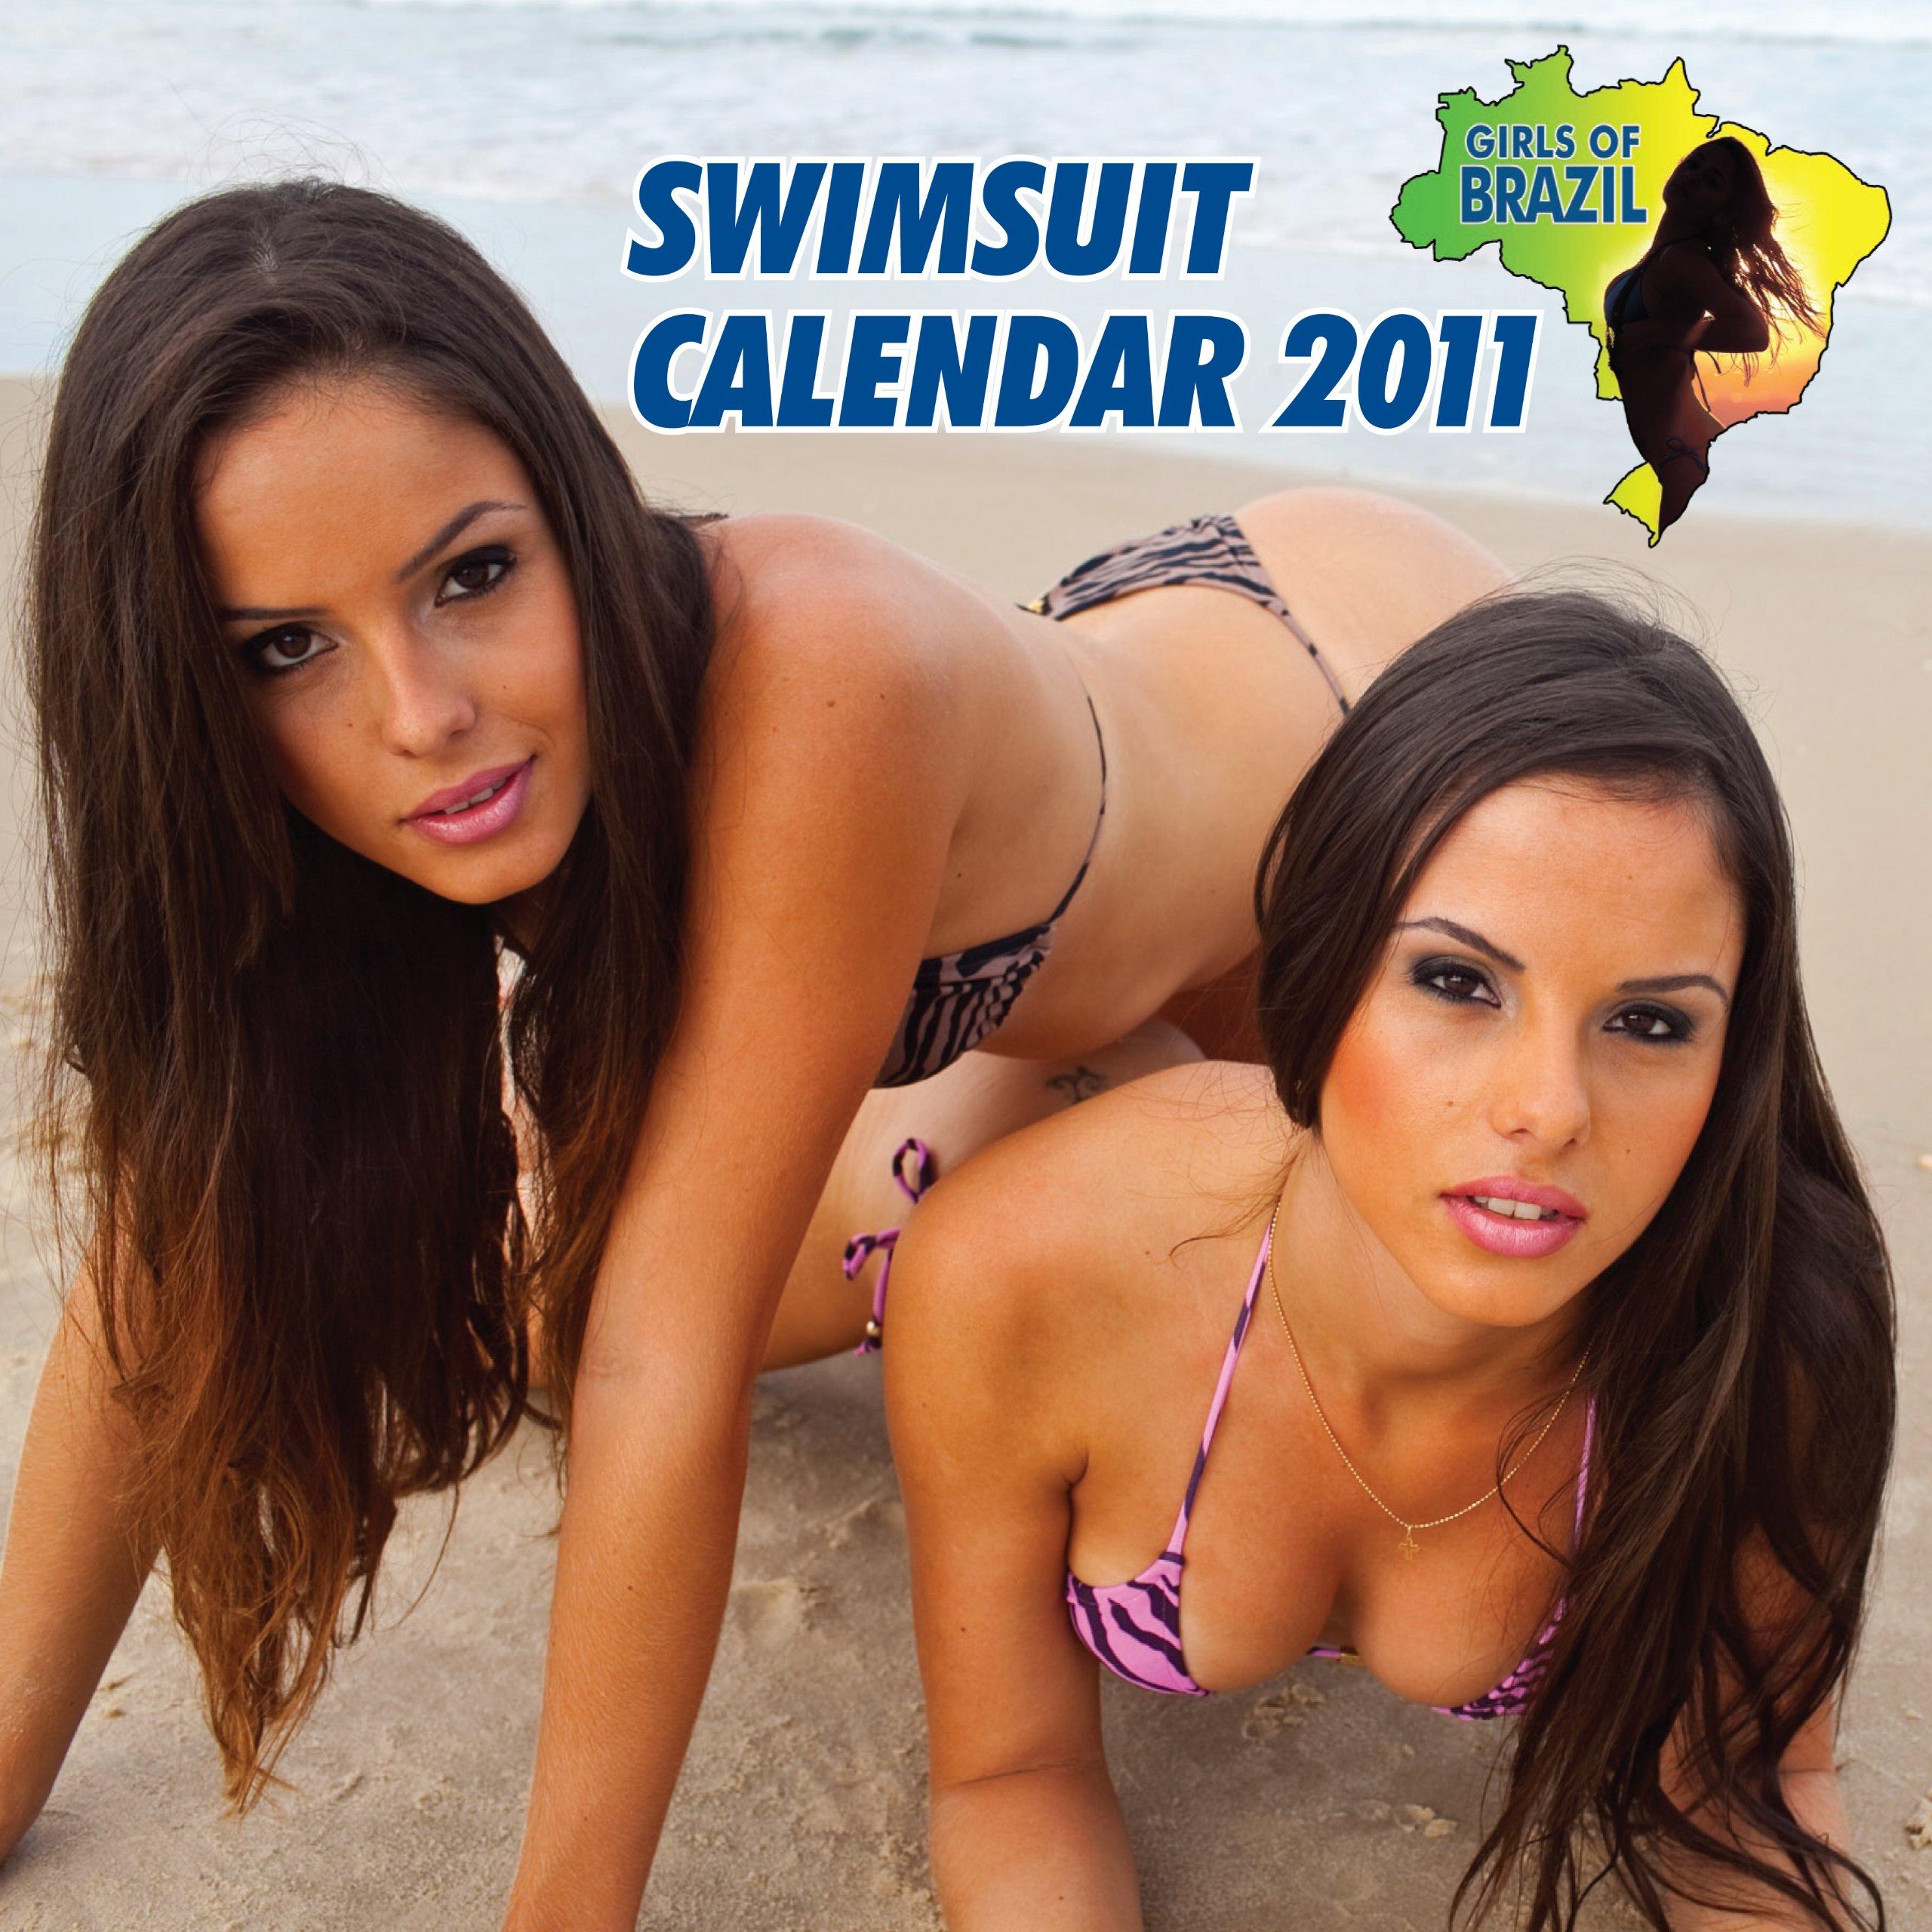 Brazil girls pics — img 5